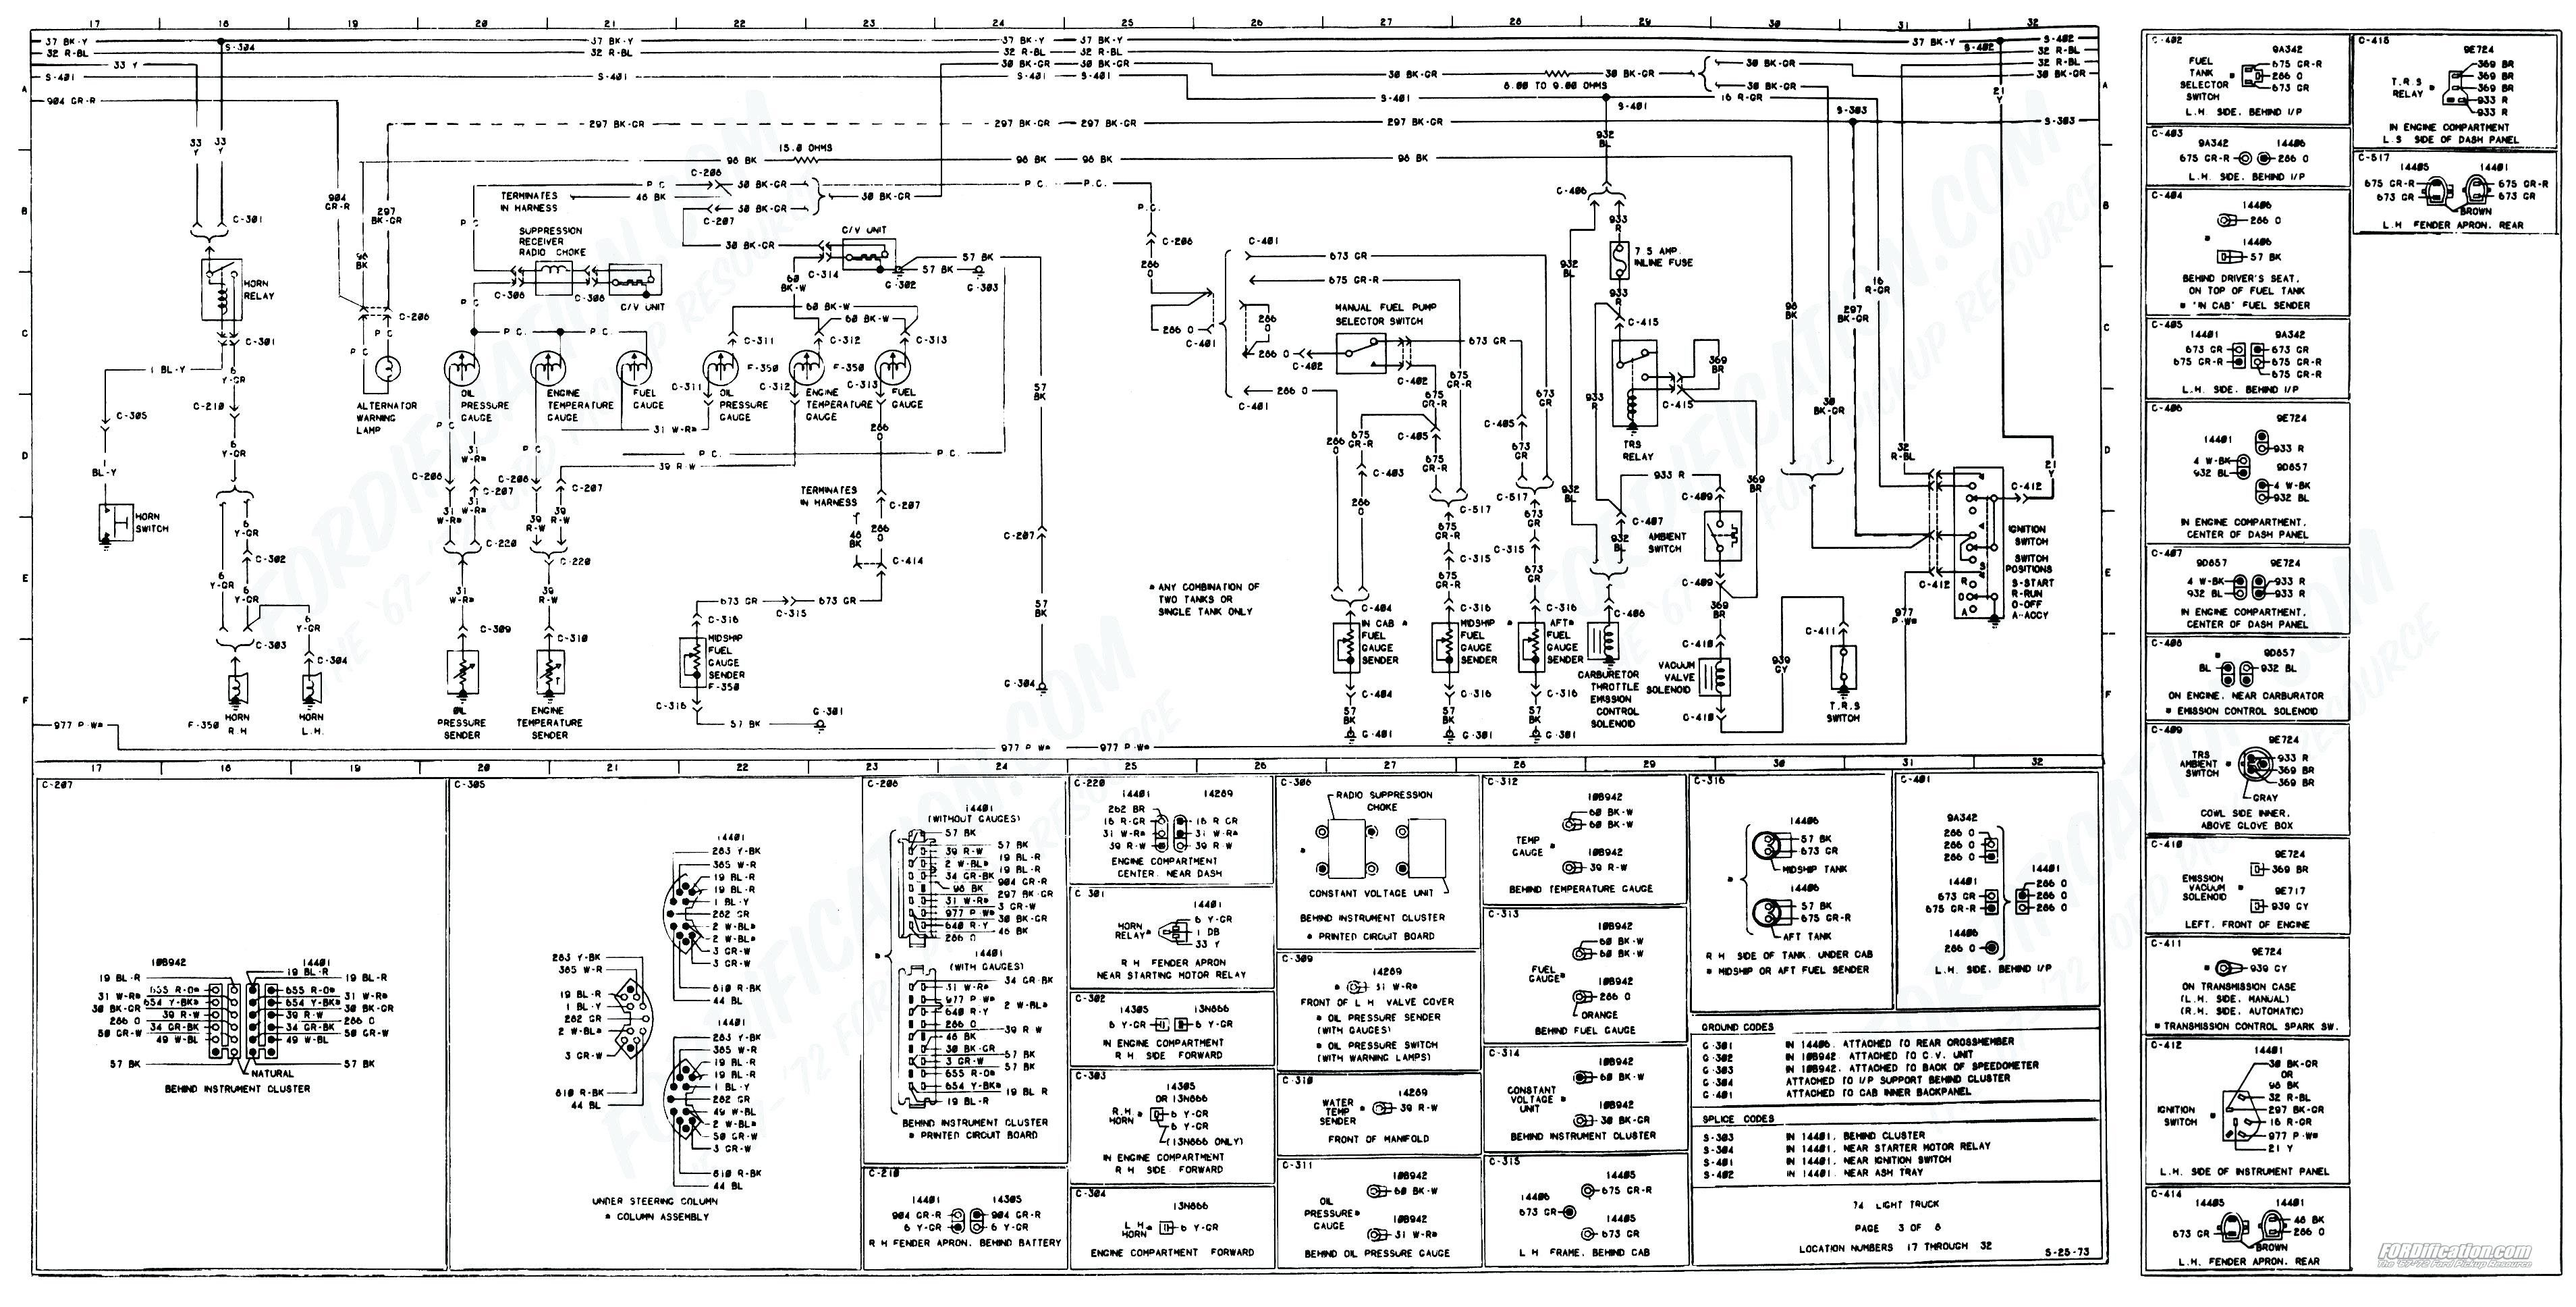 1979 chevy truck wiring diagram beautiful 1979 chevy truck wiring diagram steering column delay wipers bytes [ 3817 x 1936 Pixel ]